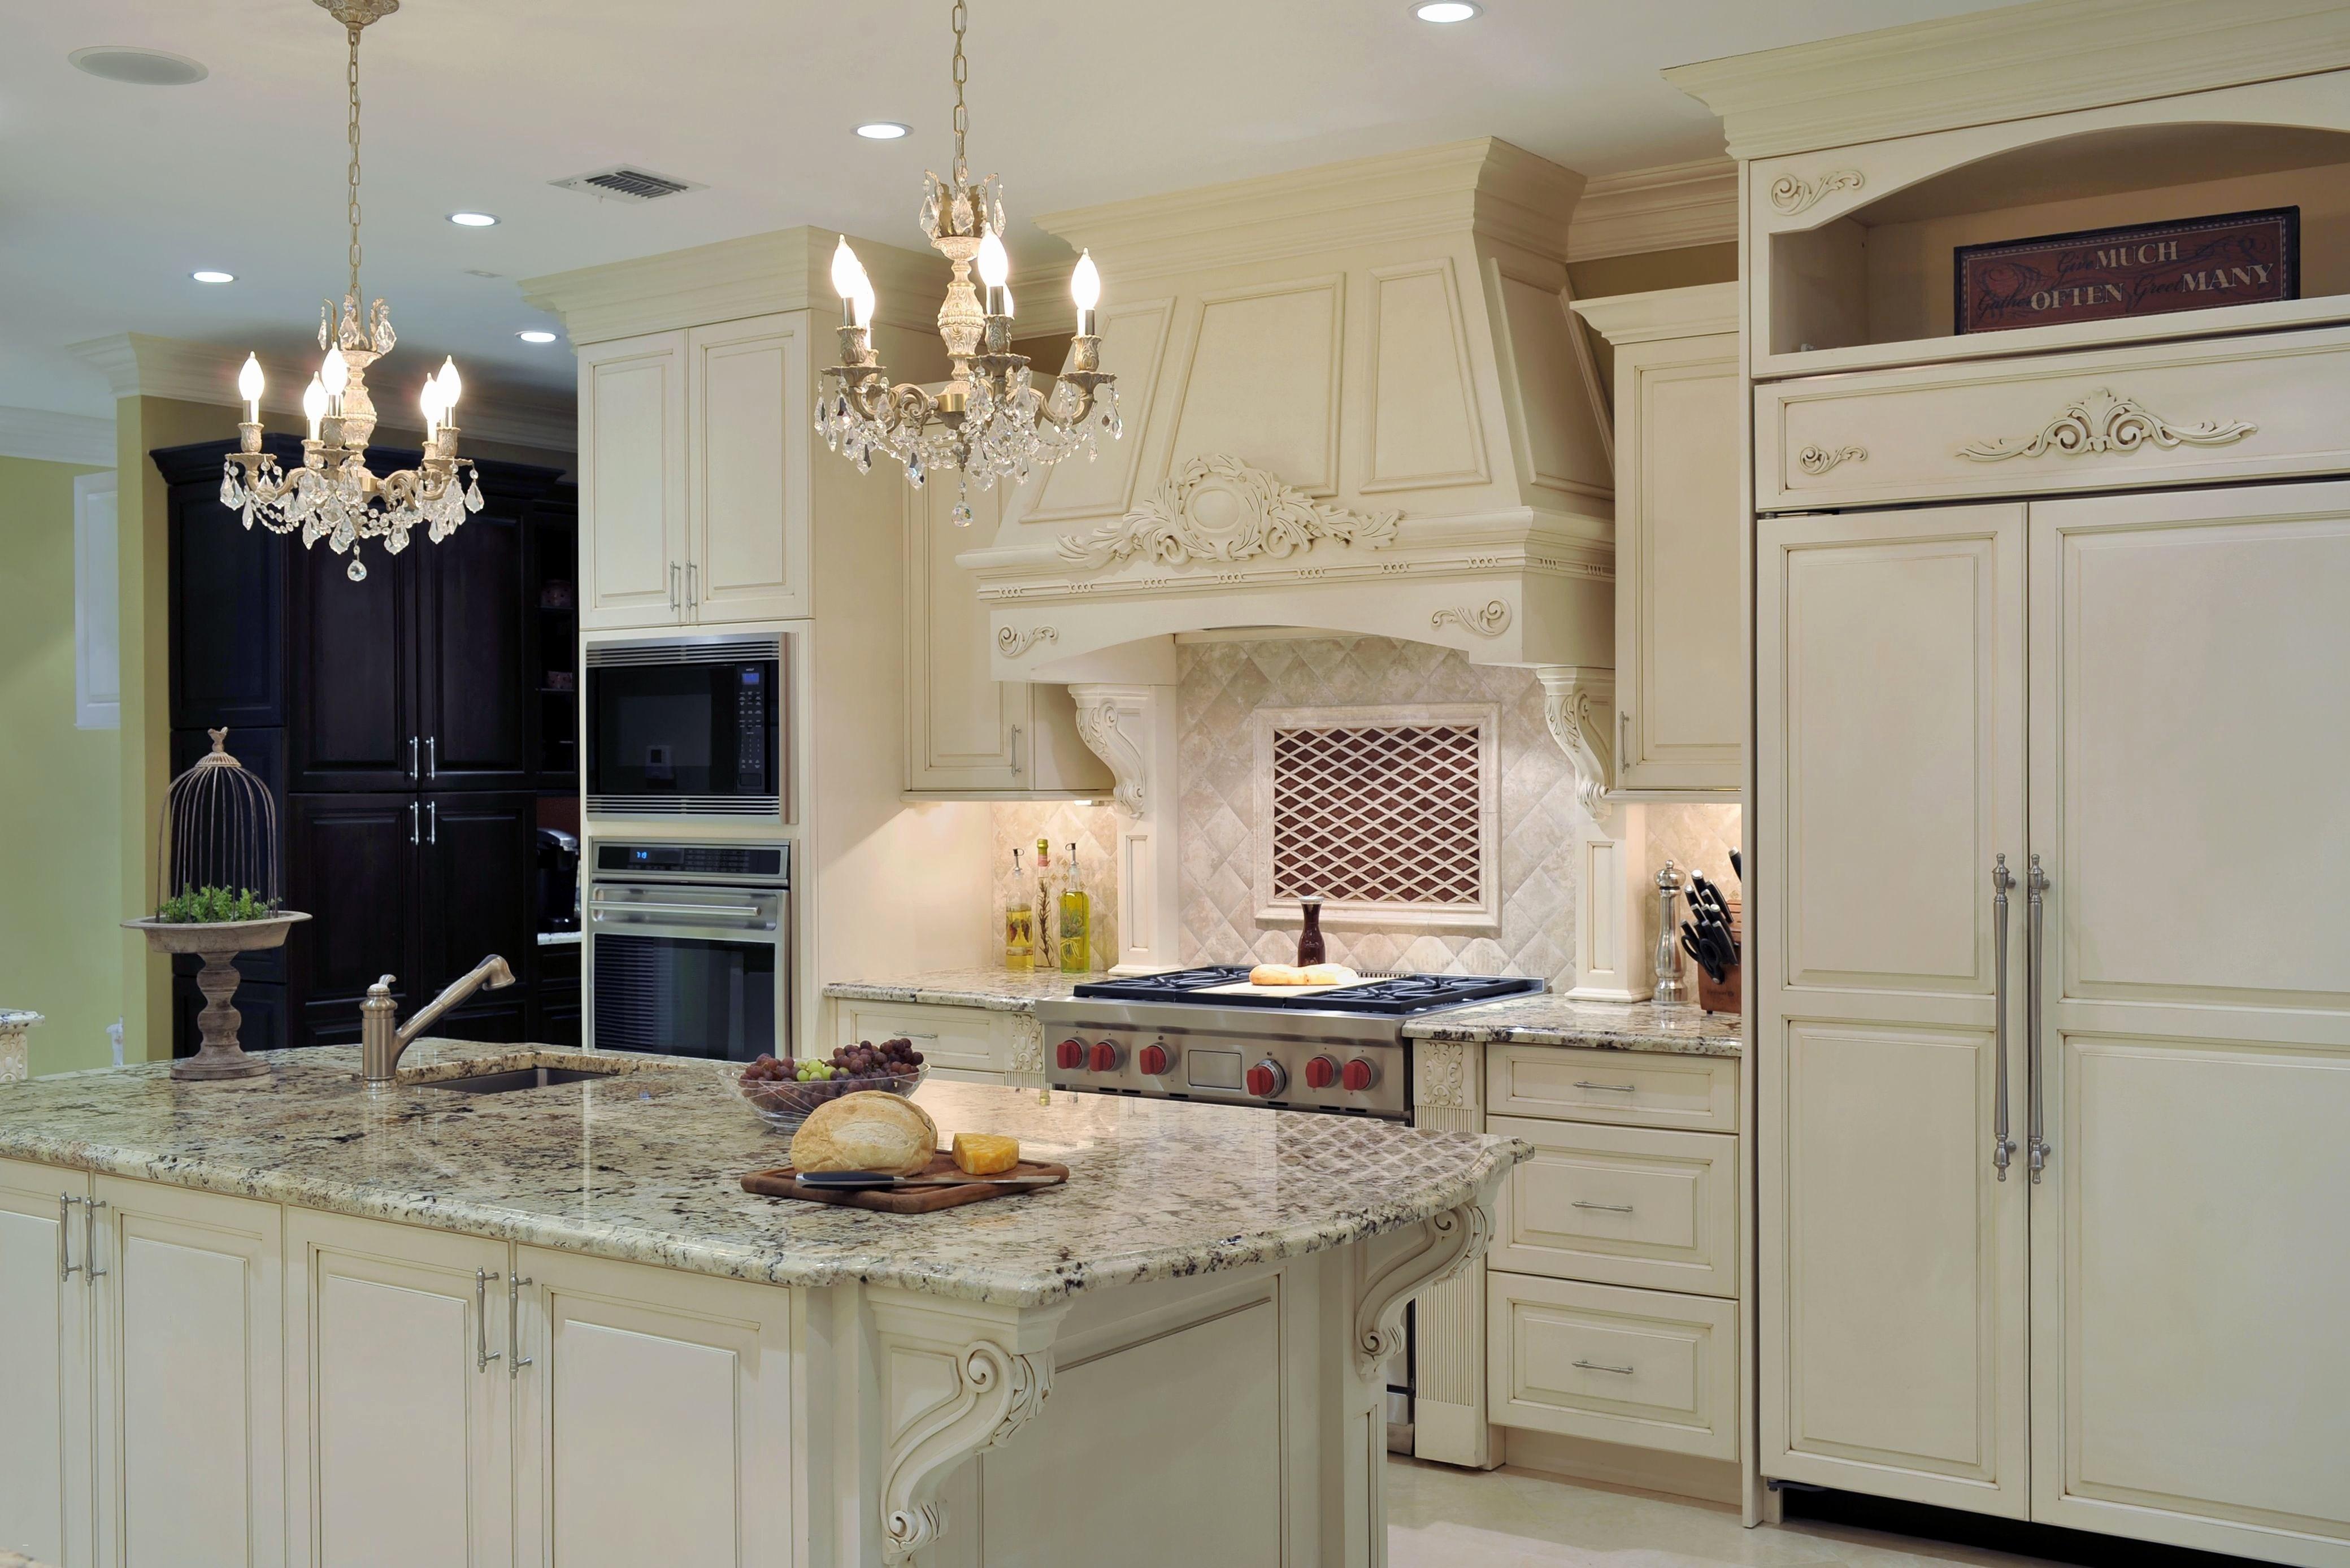 Brown Kitchen Cabinets – Brilliant Kitchen Cabinet Lights Cool Colored Kitchen Cabinets Elegant Kitchen